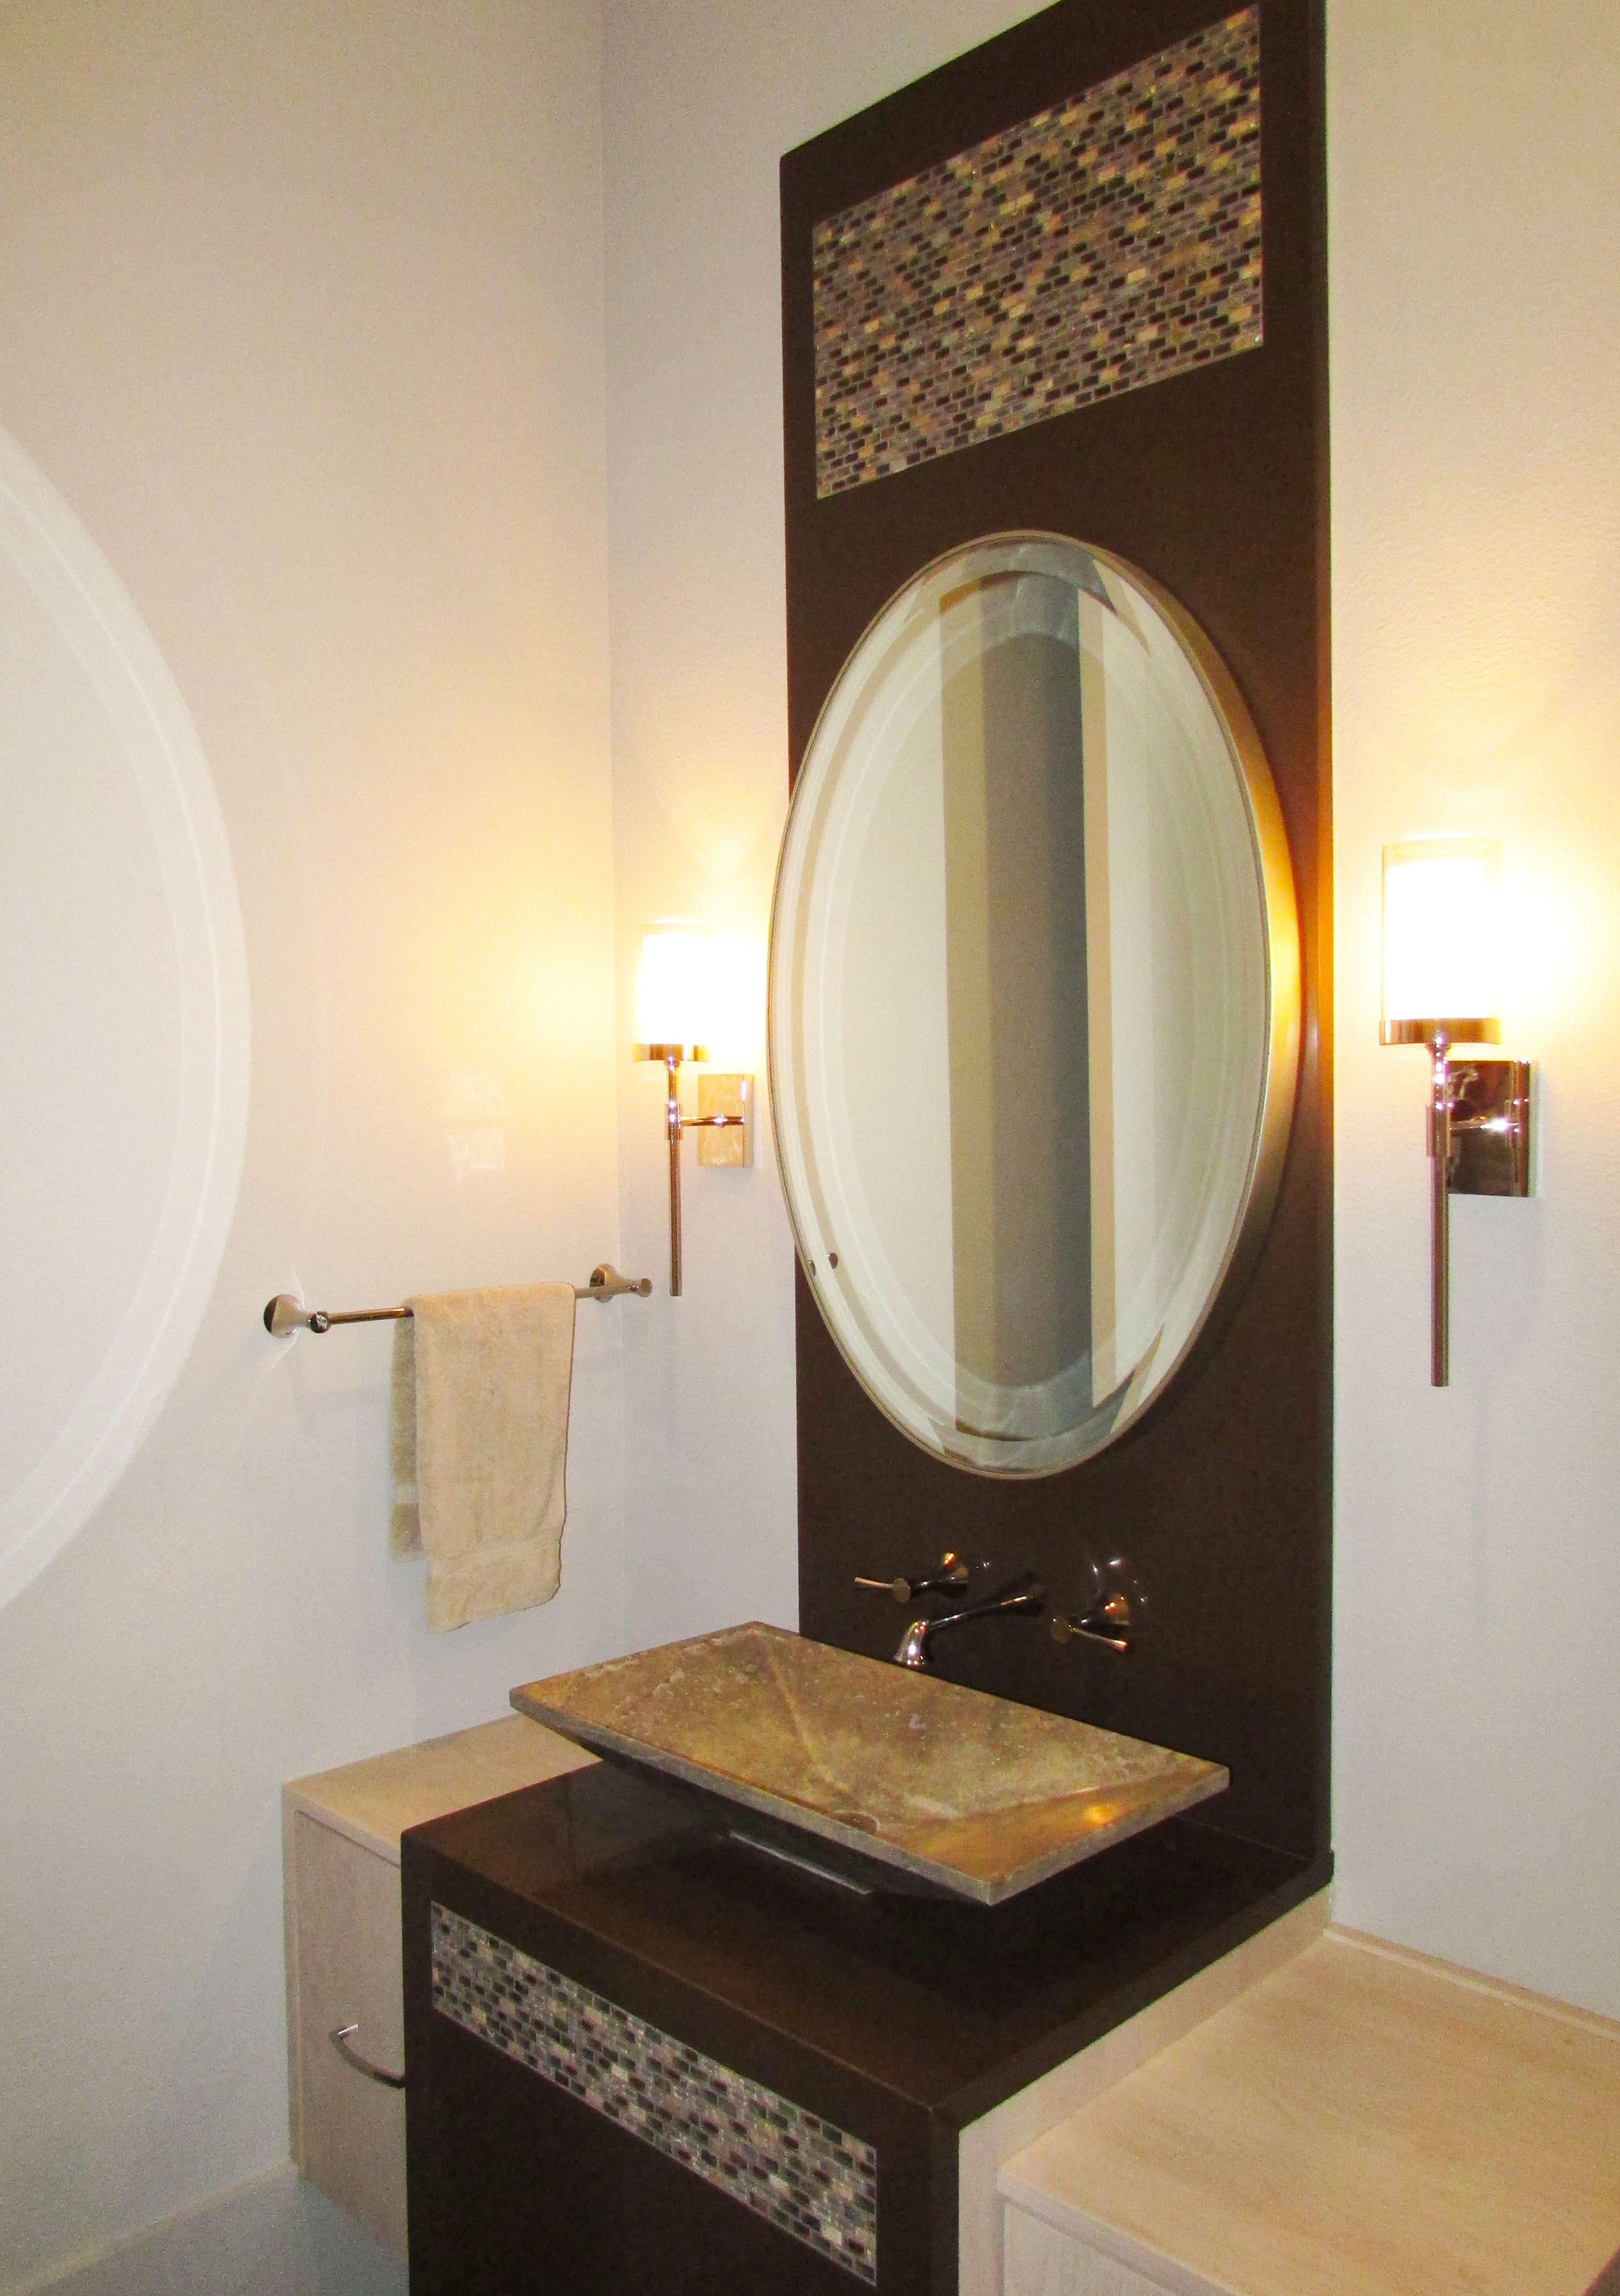 Bed And Bath Mary Ann Downey Interior Design Bathrooms Pinterest